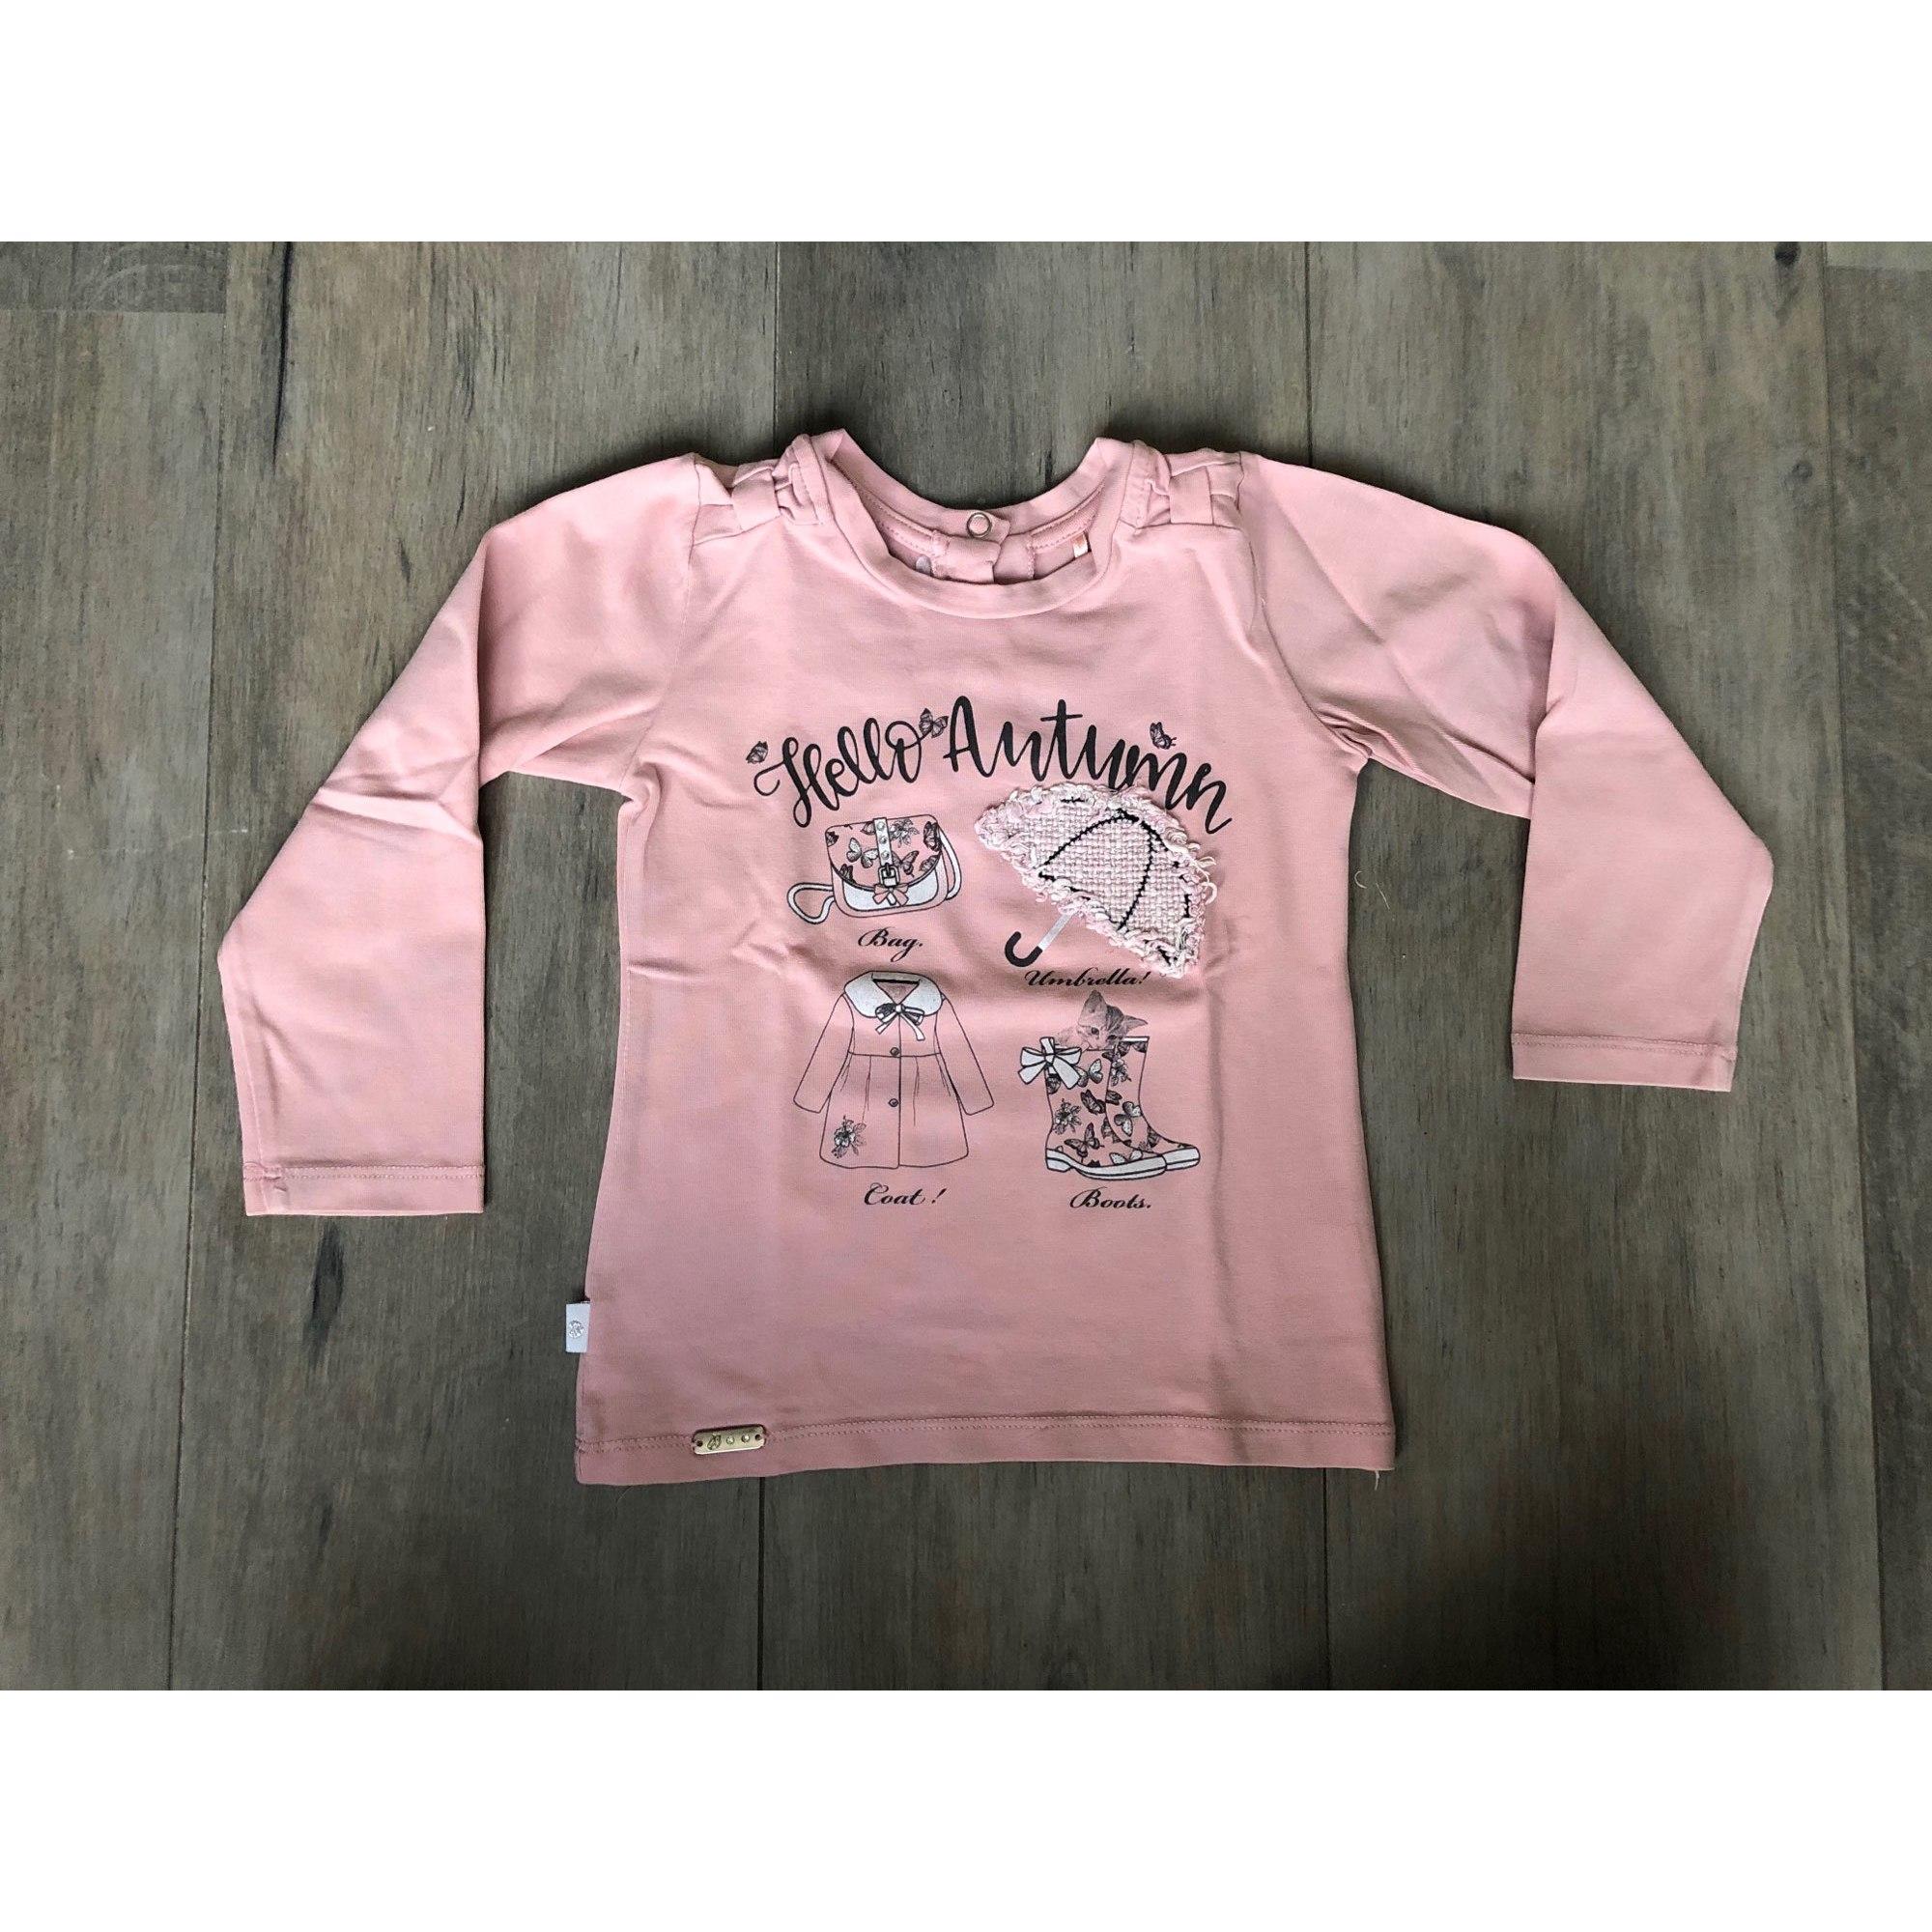 Top, Tee-shirt BEBAKIDS Rose, fuschia, vieux rose